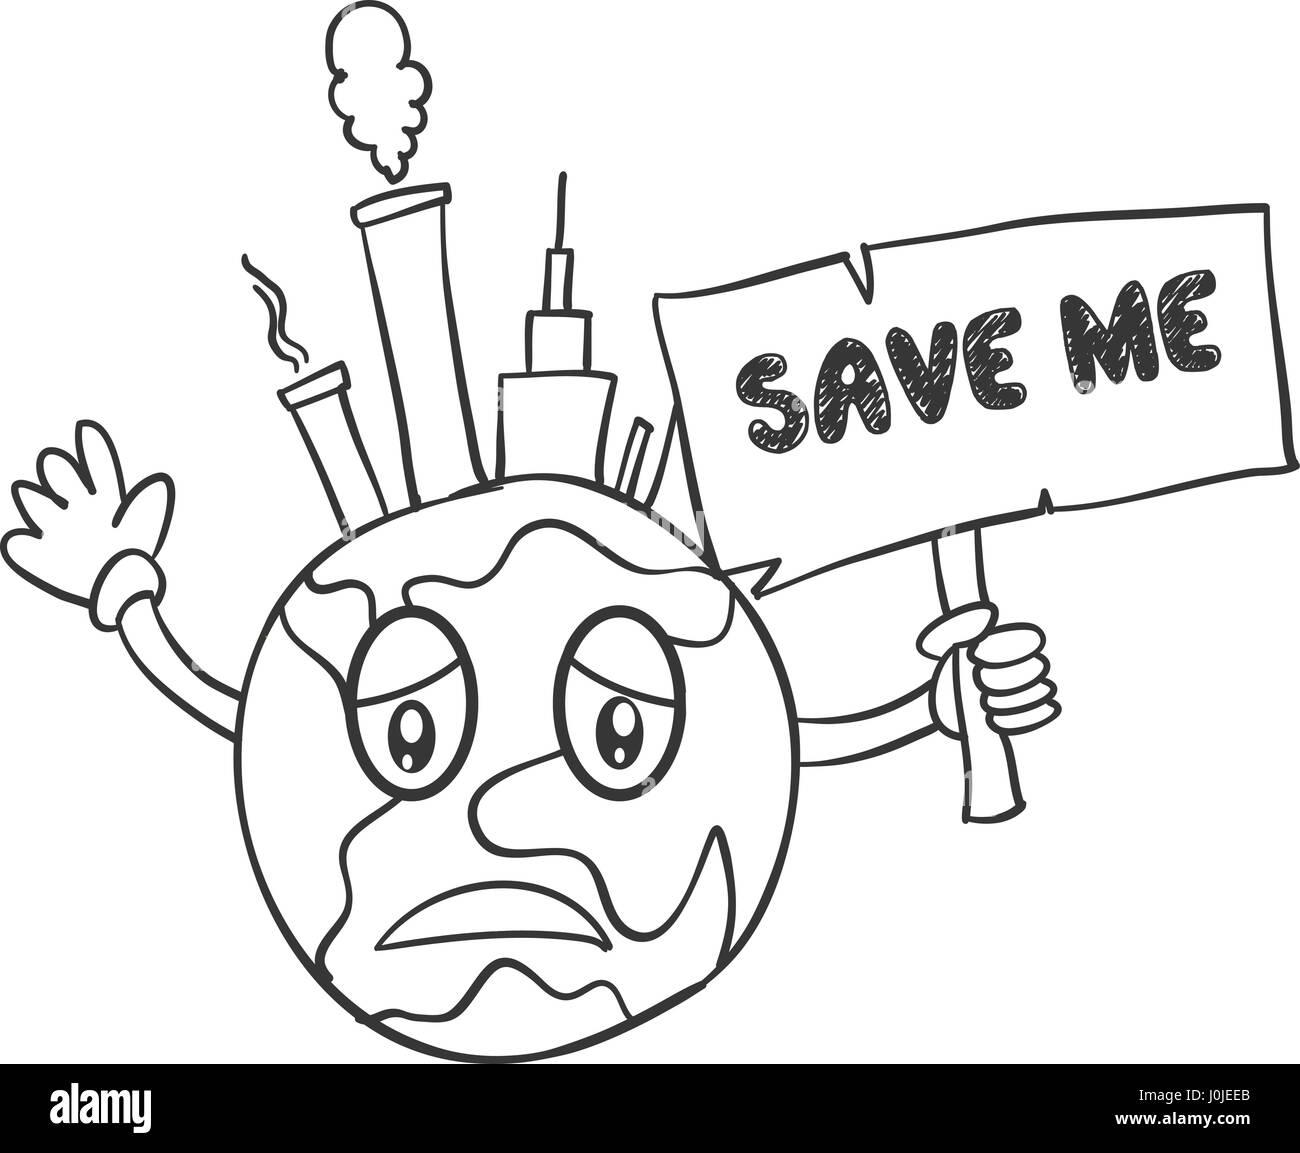 Hand Draw Of World Earth Day Stock Vector Art Illustration Vector